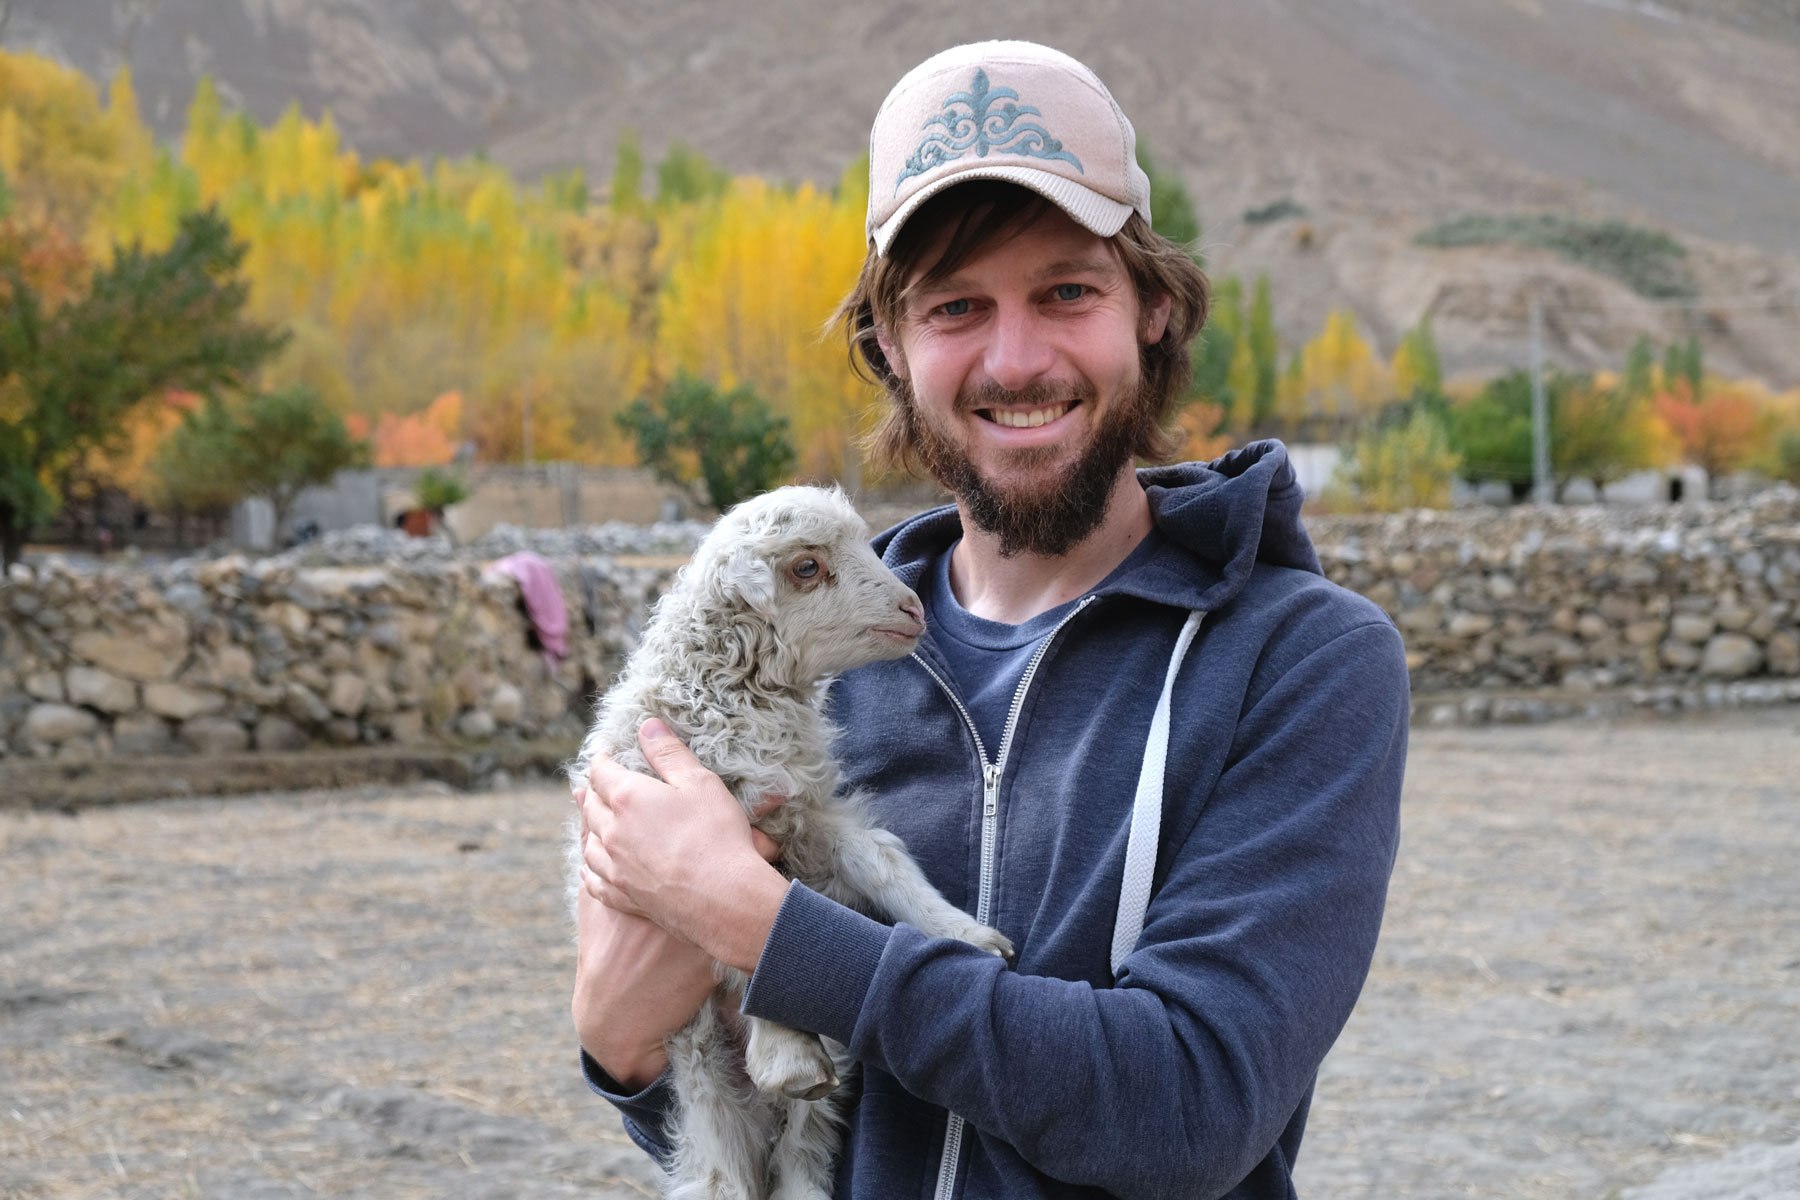 Sebastian hält ein Lamm auf dem Arm.